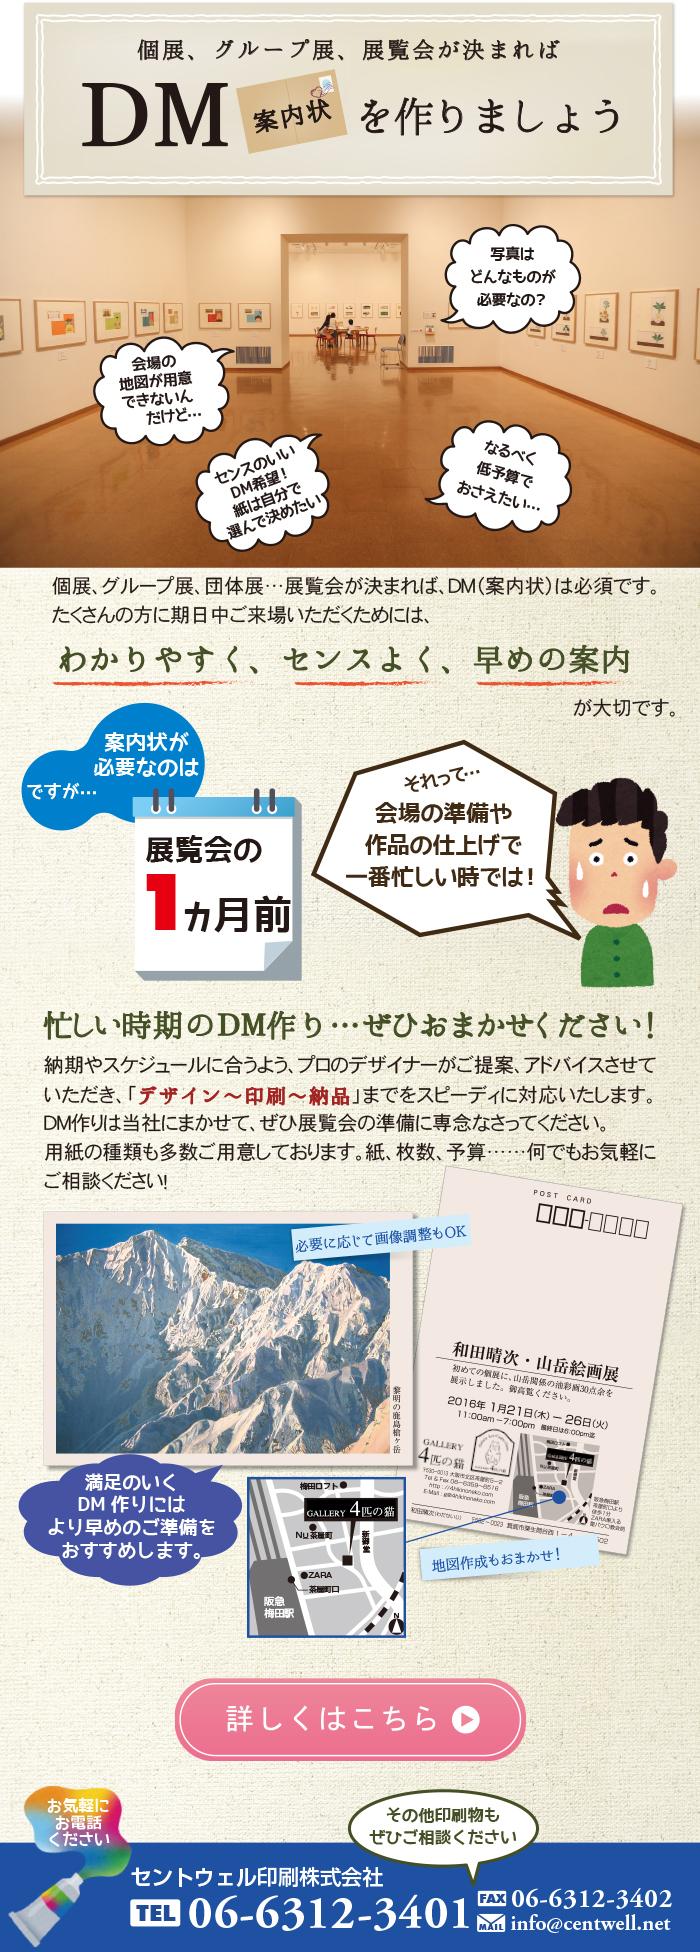 DM 案内状の印刷ならセントウェル印刷株式会社(大阪 北区 梅田)